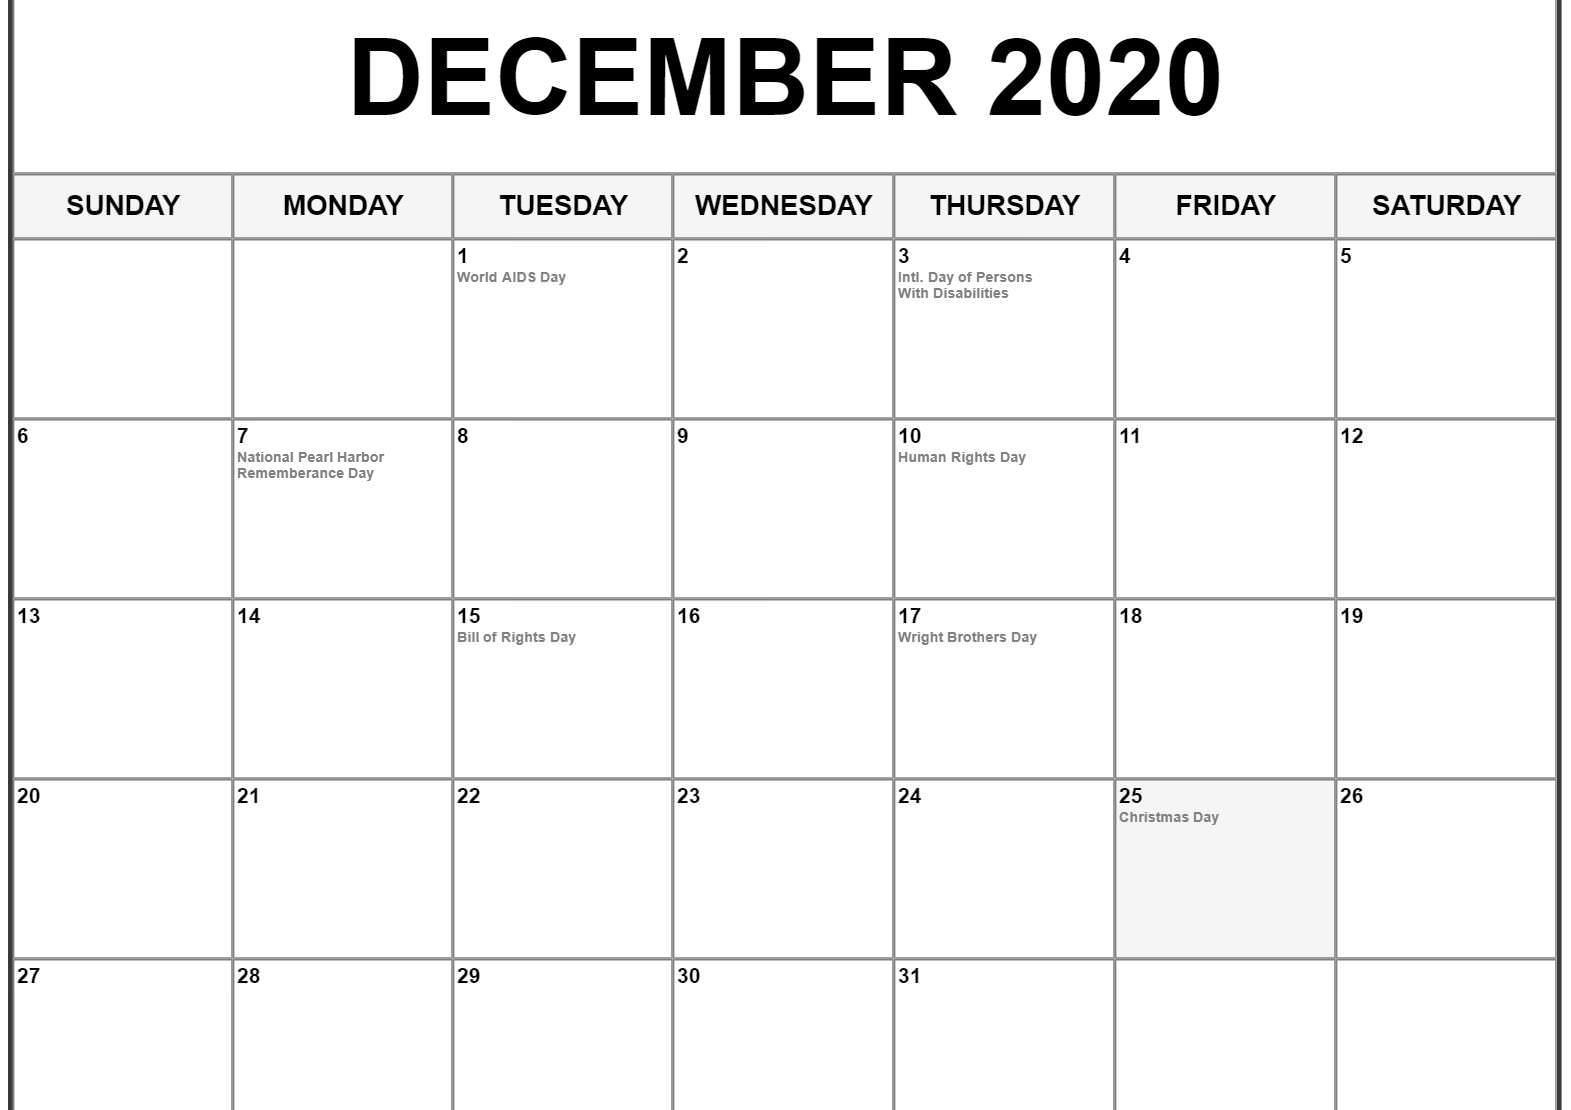 December 2020 Calendar Us Holidays   December Calendar